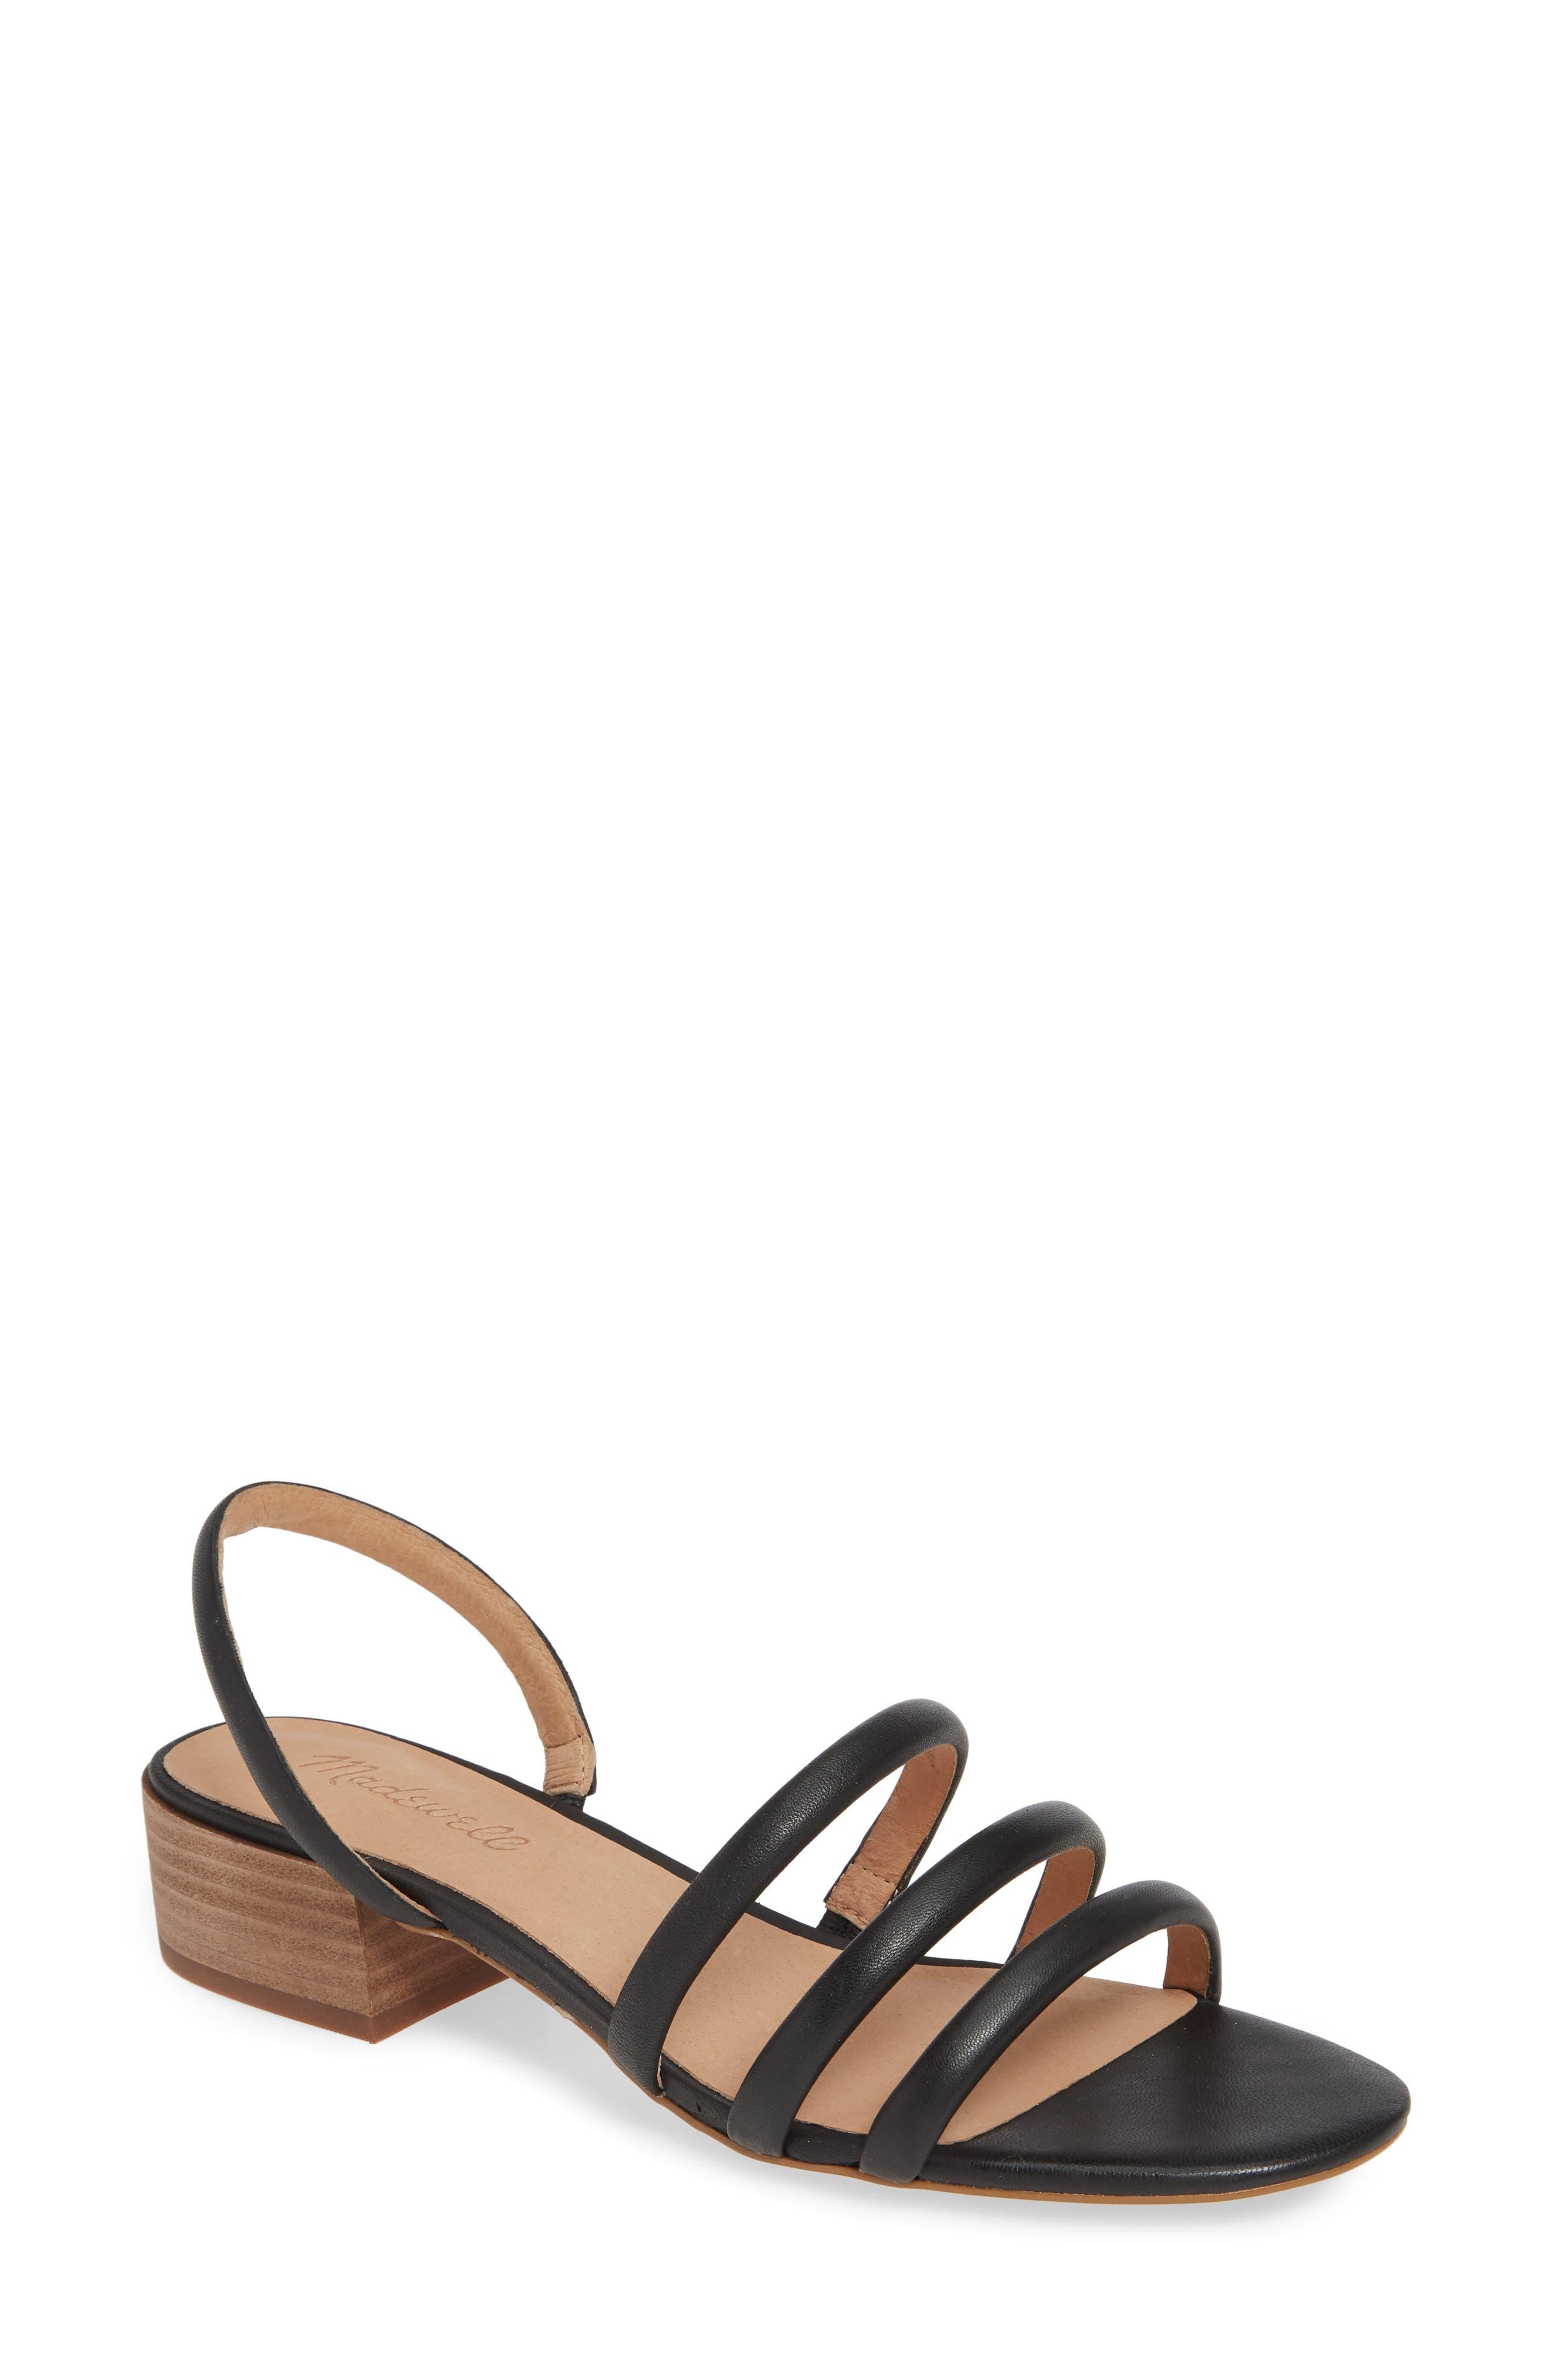 666e0b3f8661 Madewell Block-Heel Sandals for Women